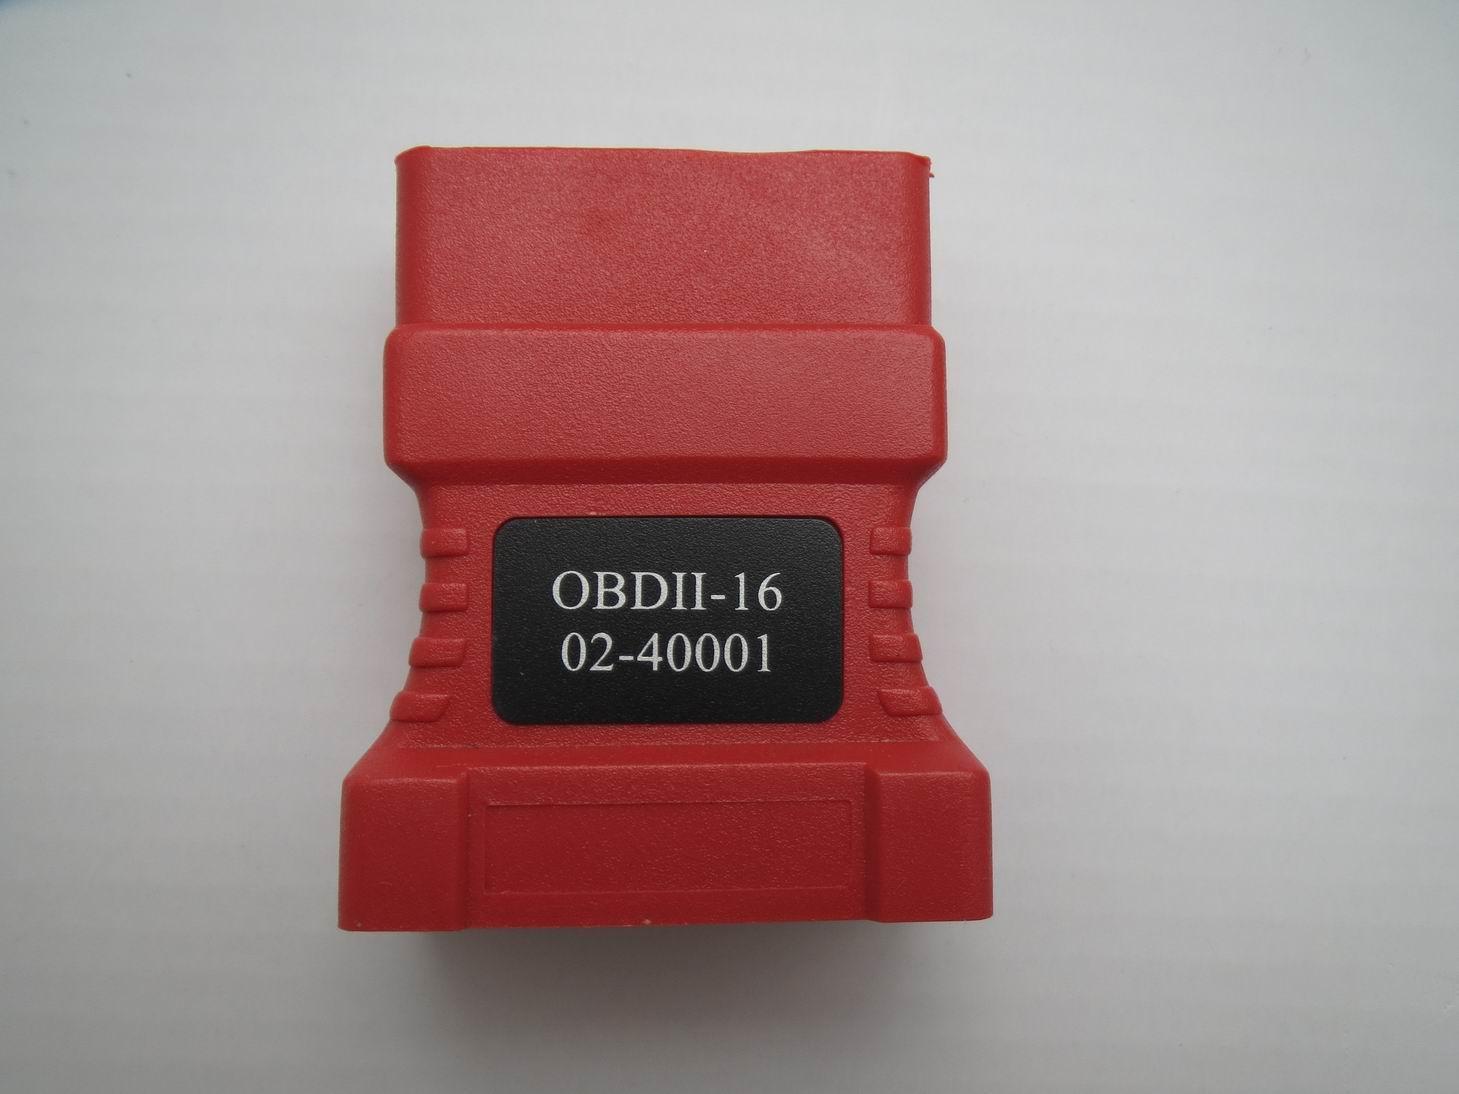 ADS-1 için O BDII-16 Bağlayıcı 02-40001 OBD-II adaptörü OBDII Obd2 Adaptörü OBD2 Connecter OBDII Ücretsiz Kargo